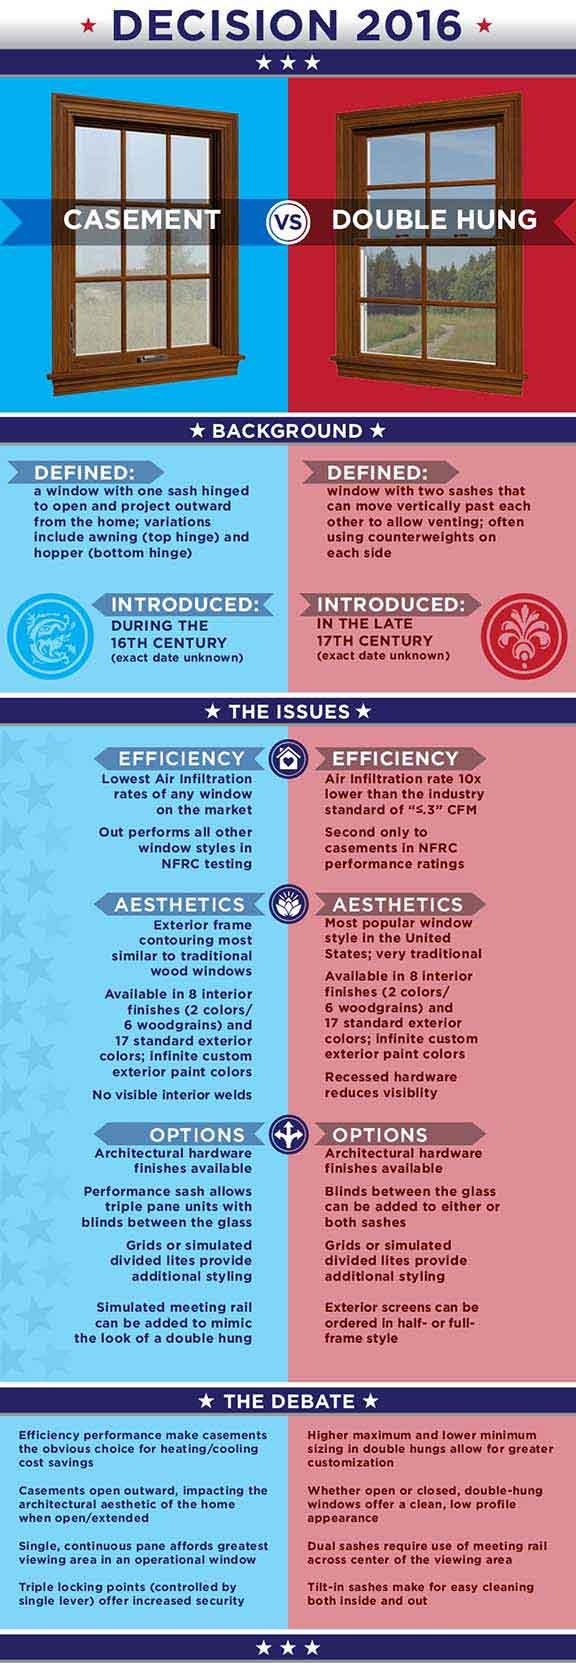 Casement vs Double Hung Infographic